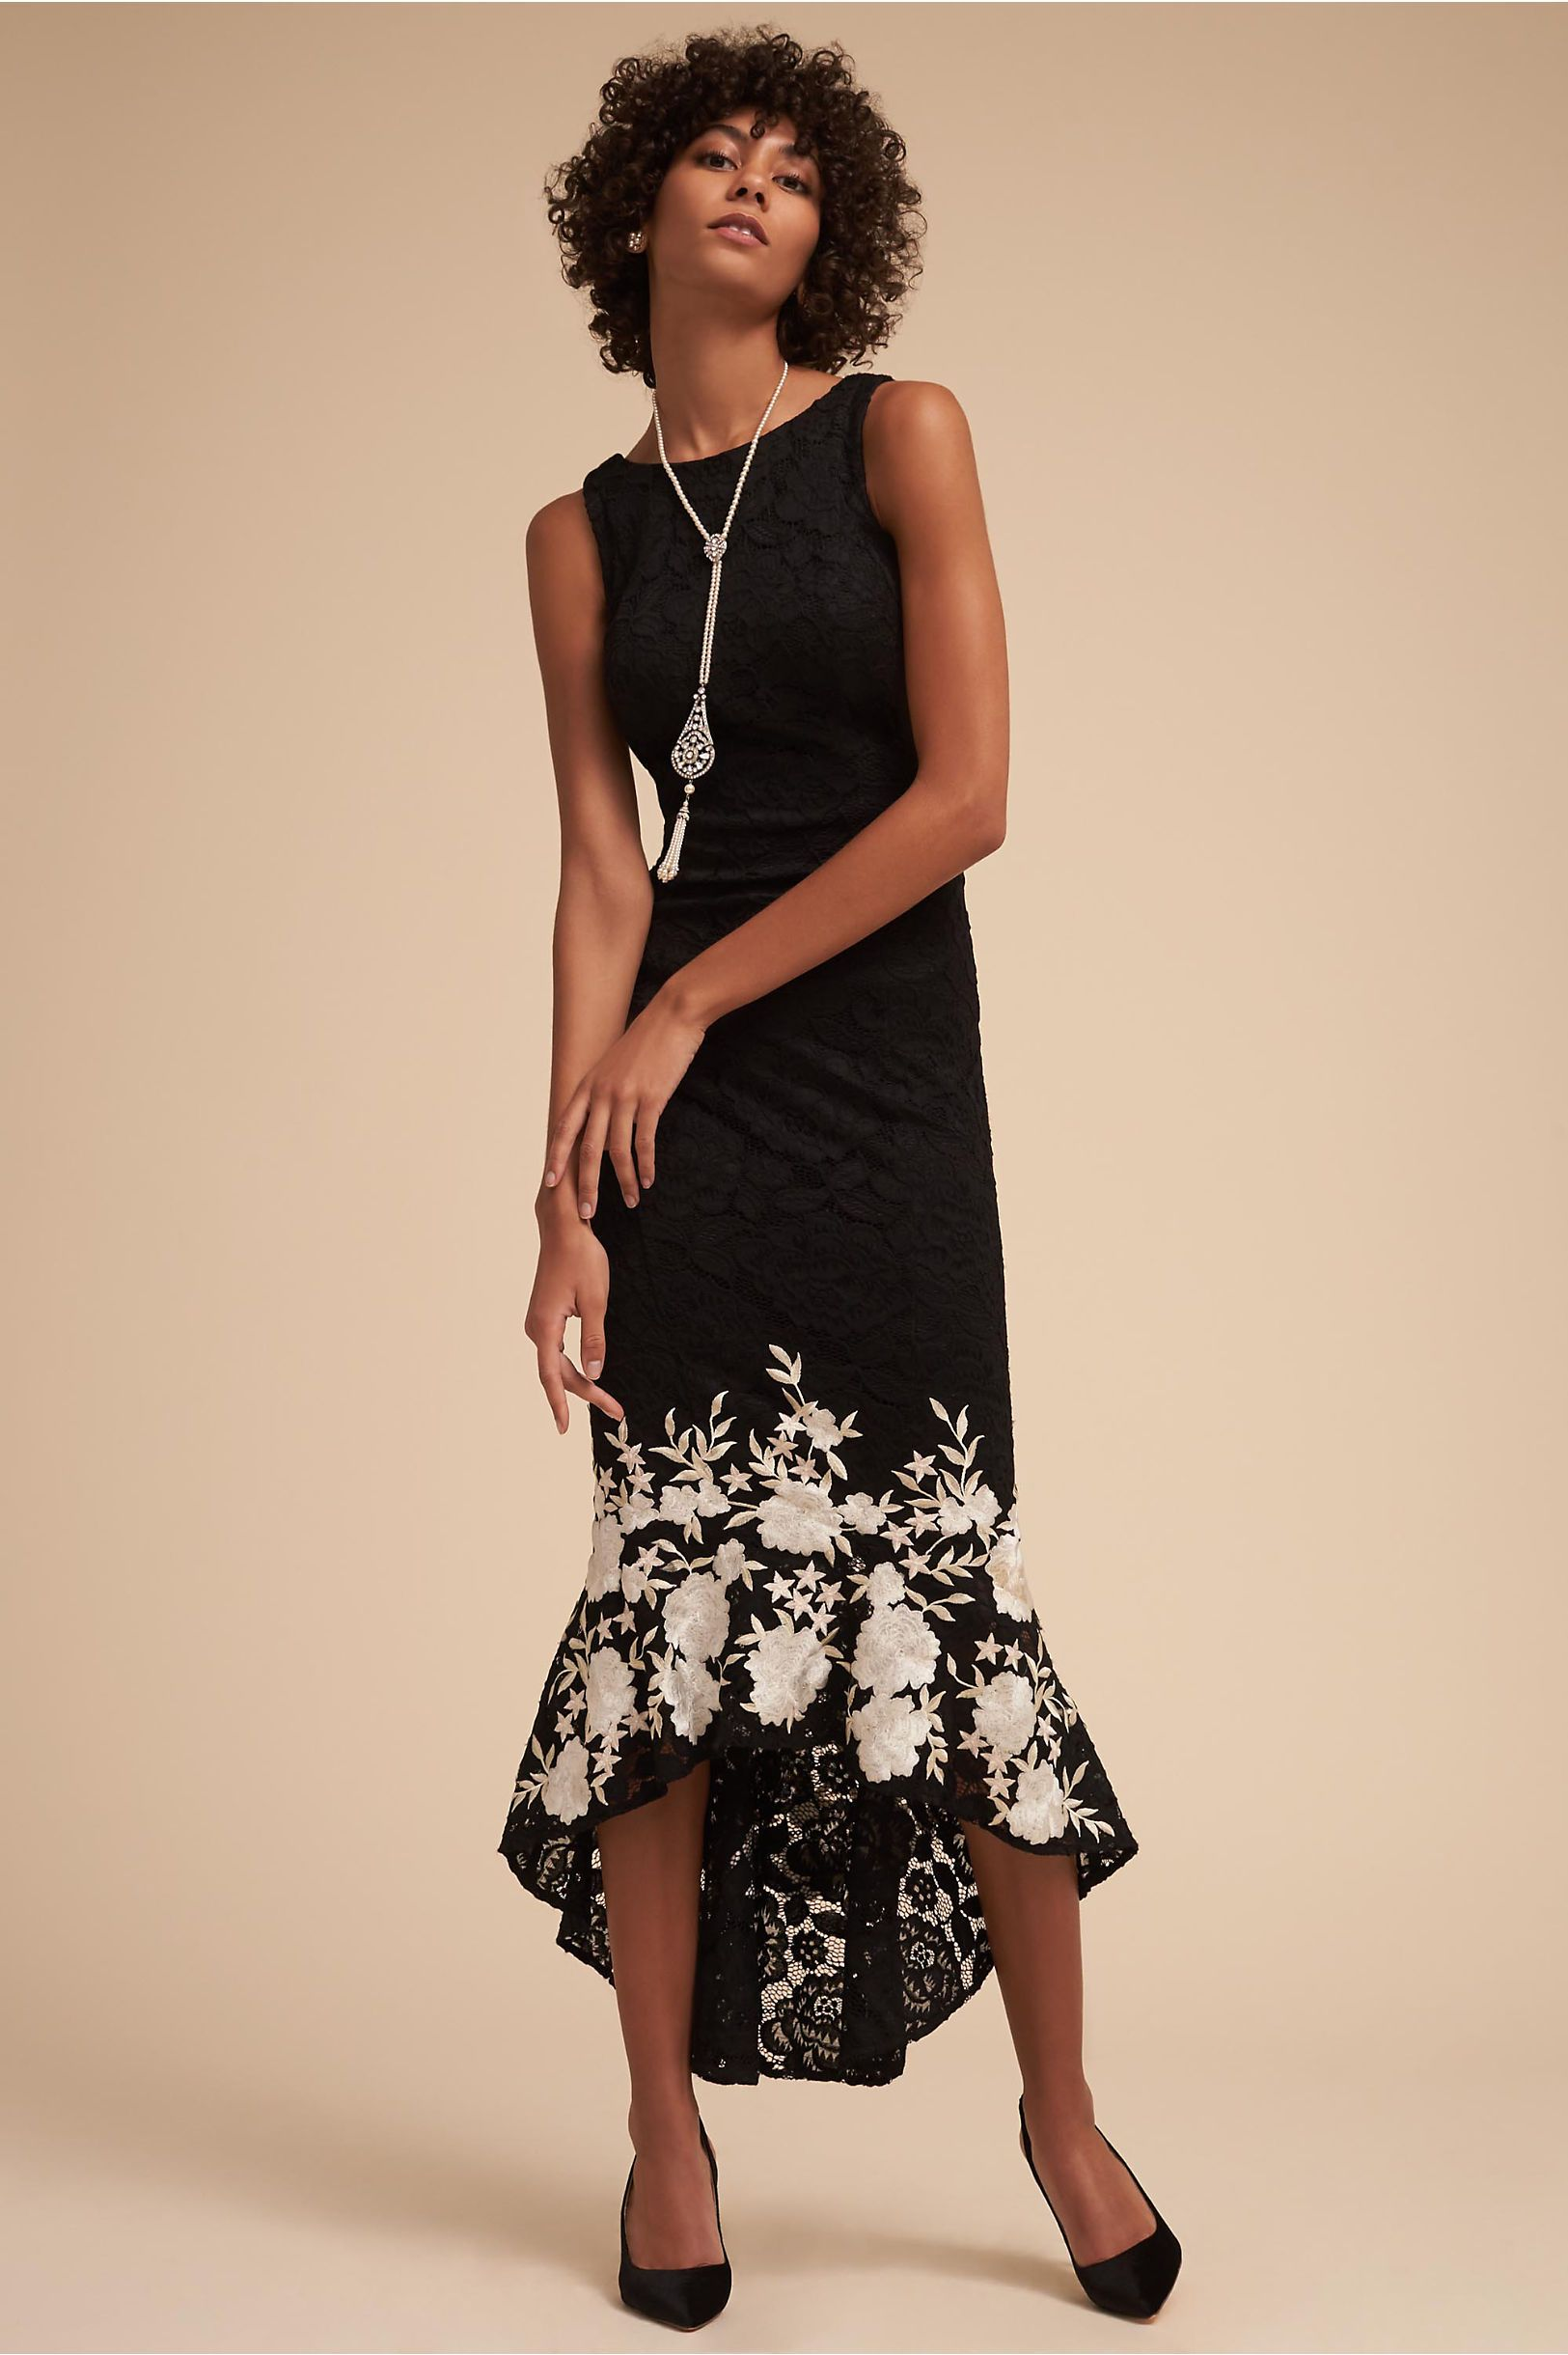 735c6ae89c BHLDN Hewitt Dress Black White in Occasion Dresses